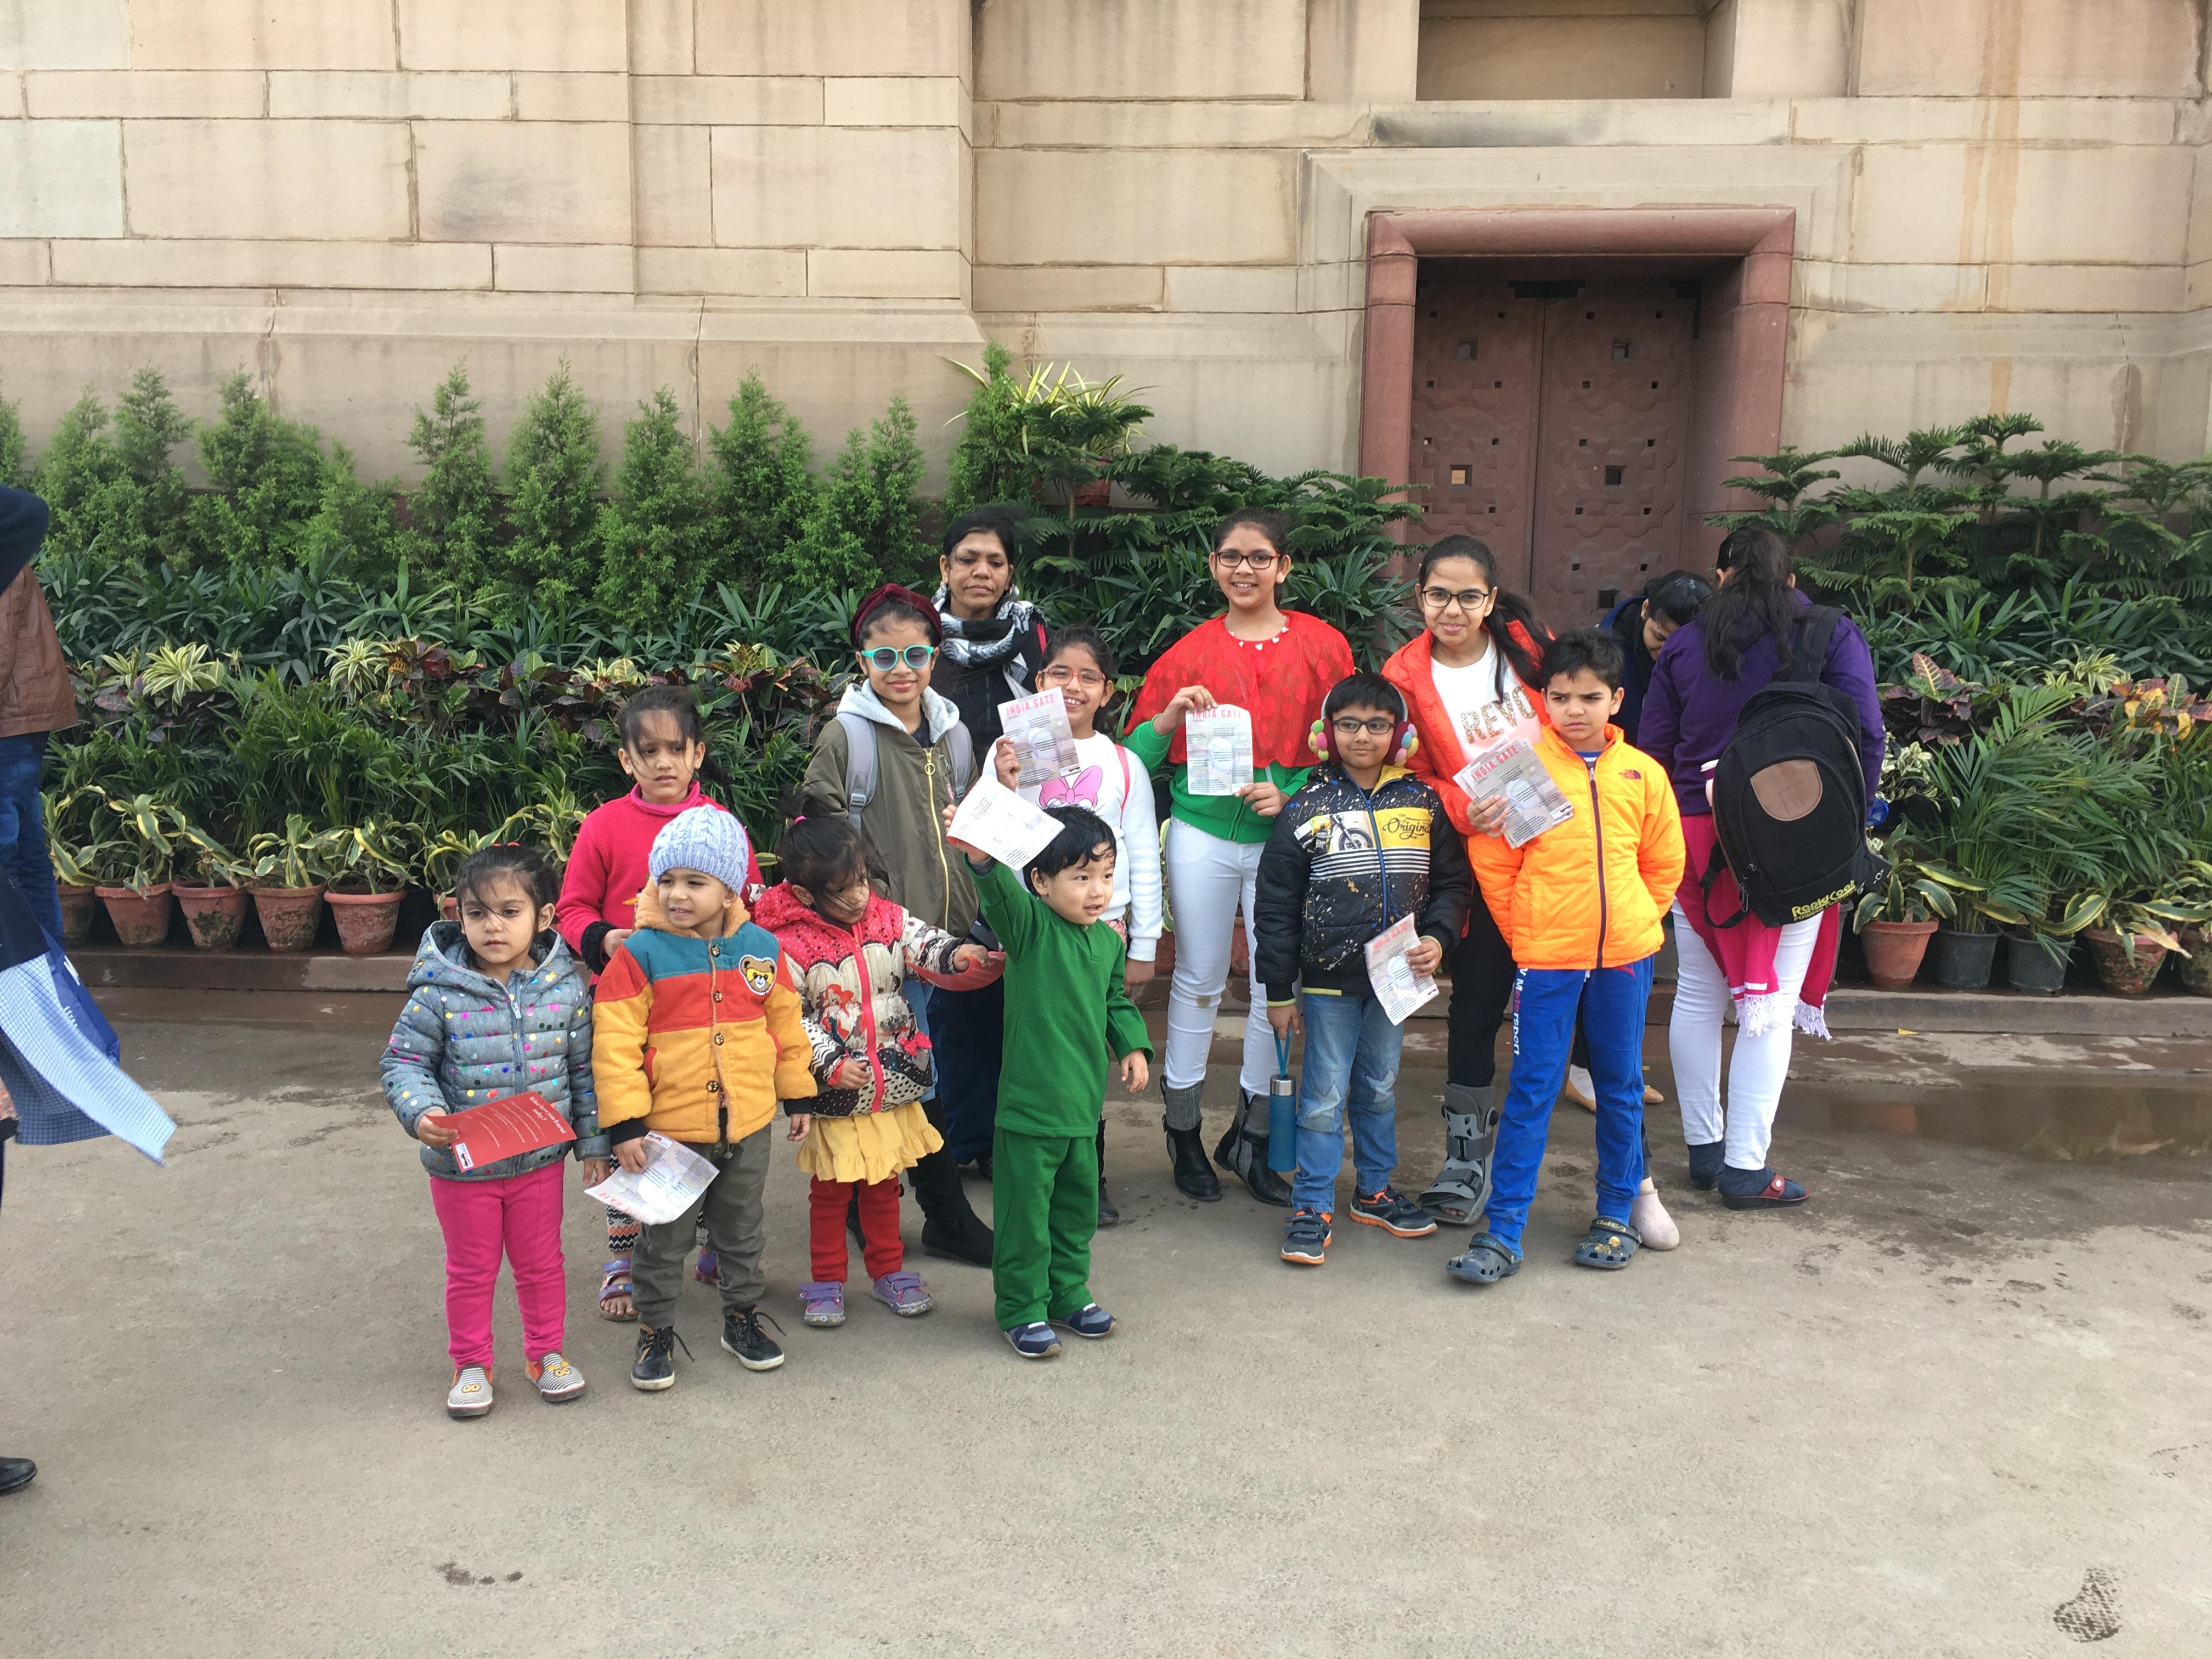 FunWagon-India Gate tours.jpg